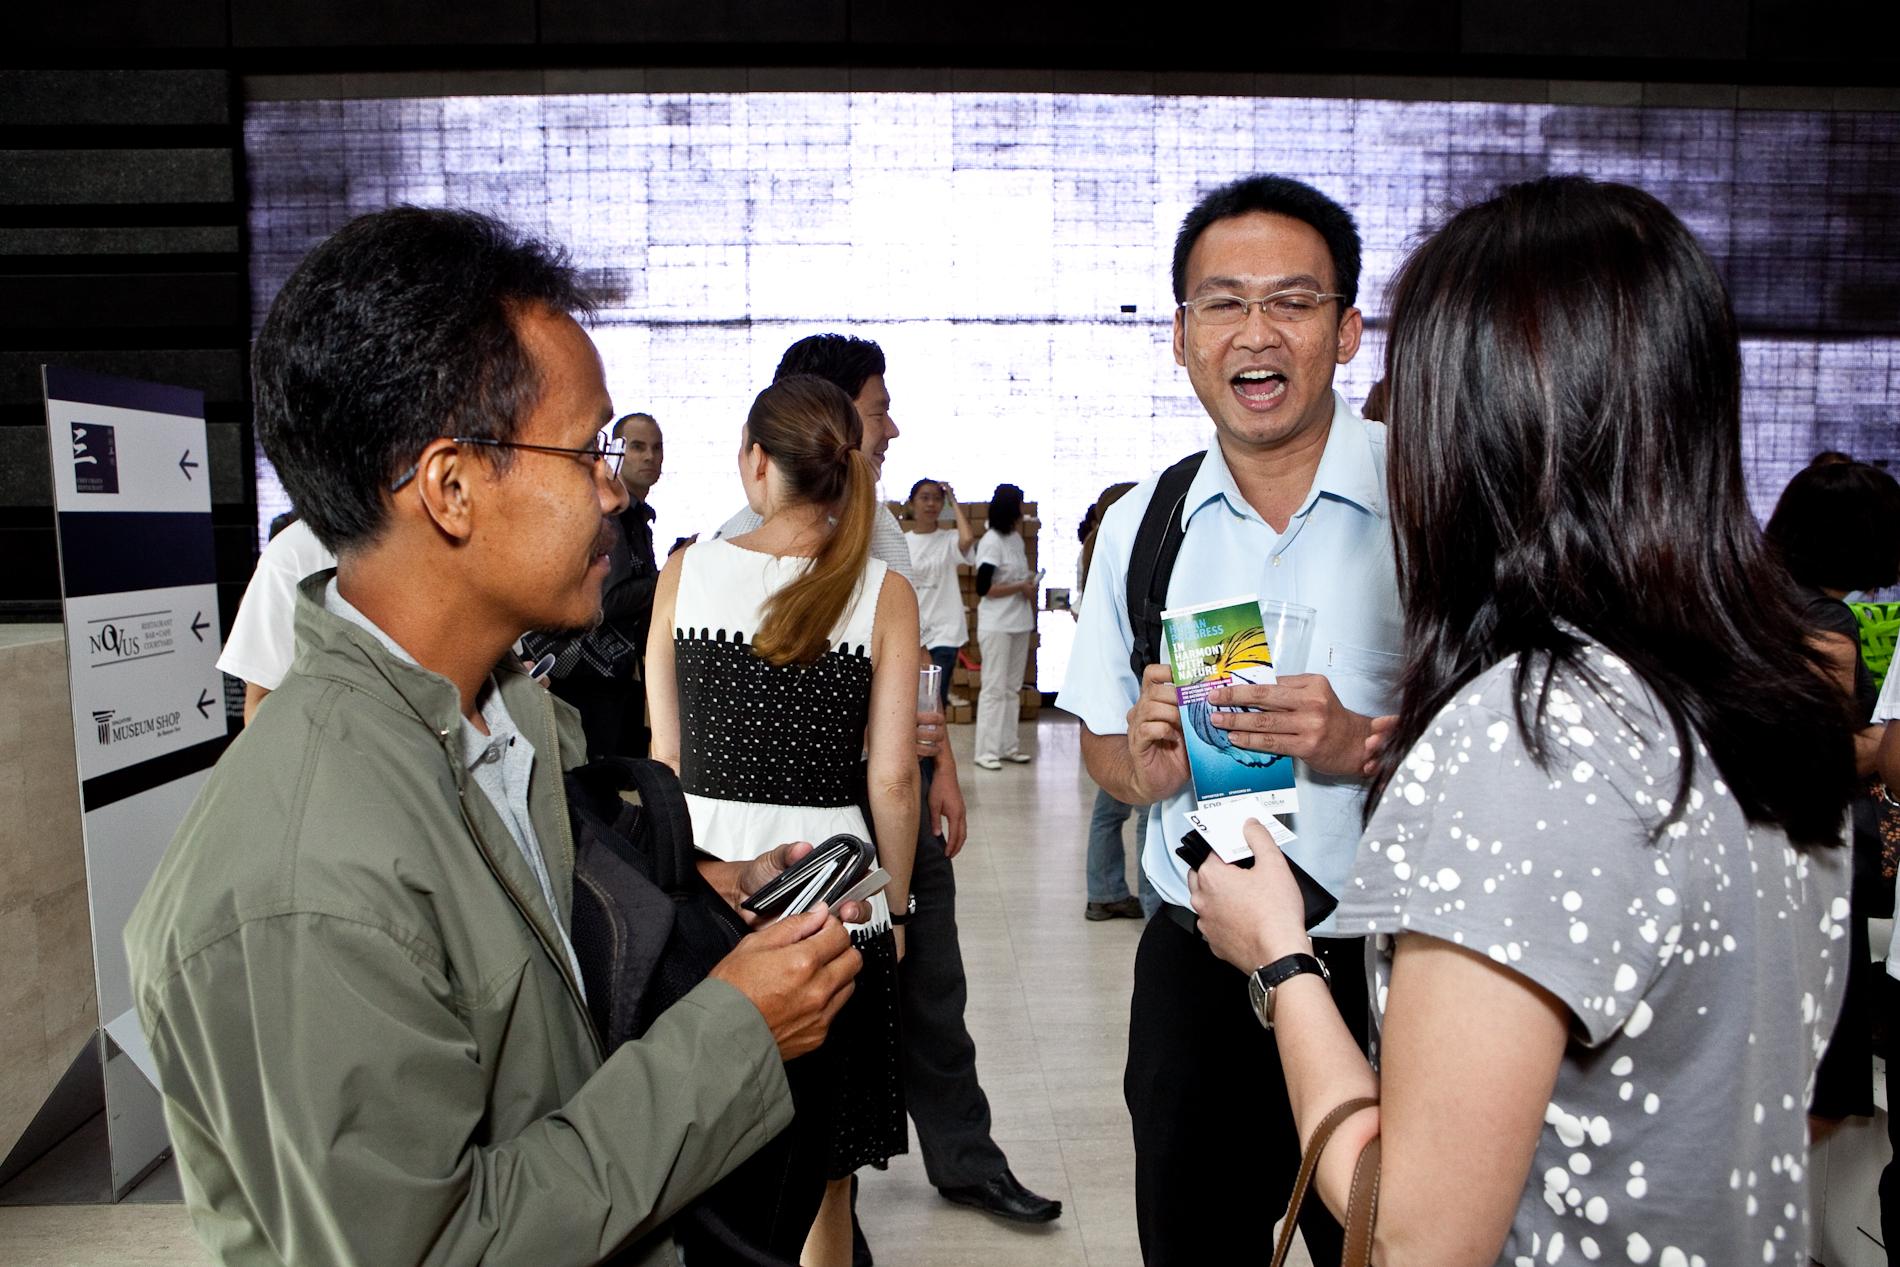 qi-global-2009-sustaible-design-singapore-046.jpg